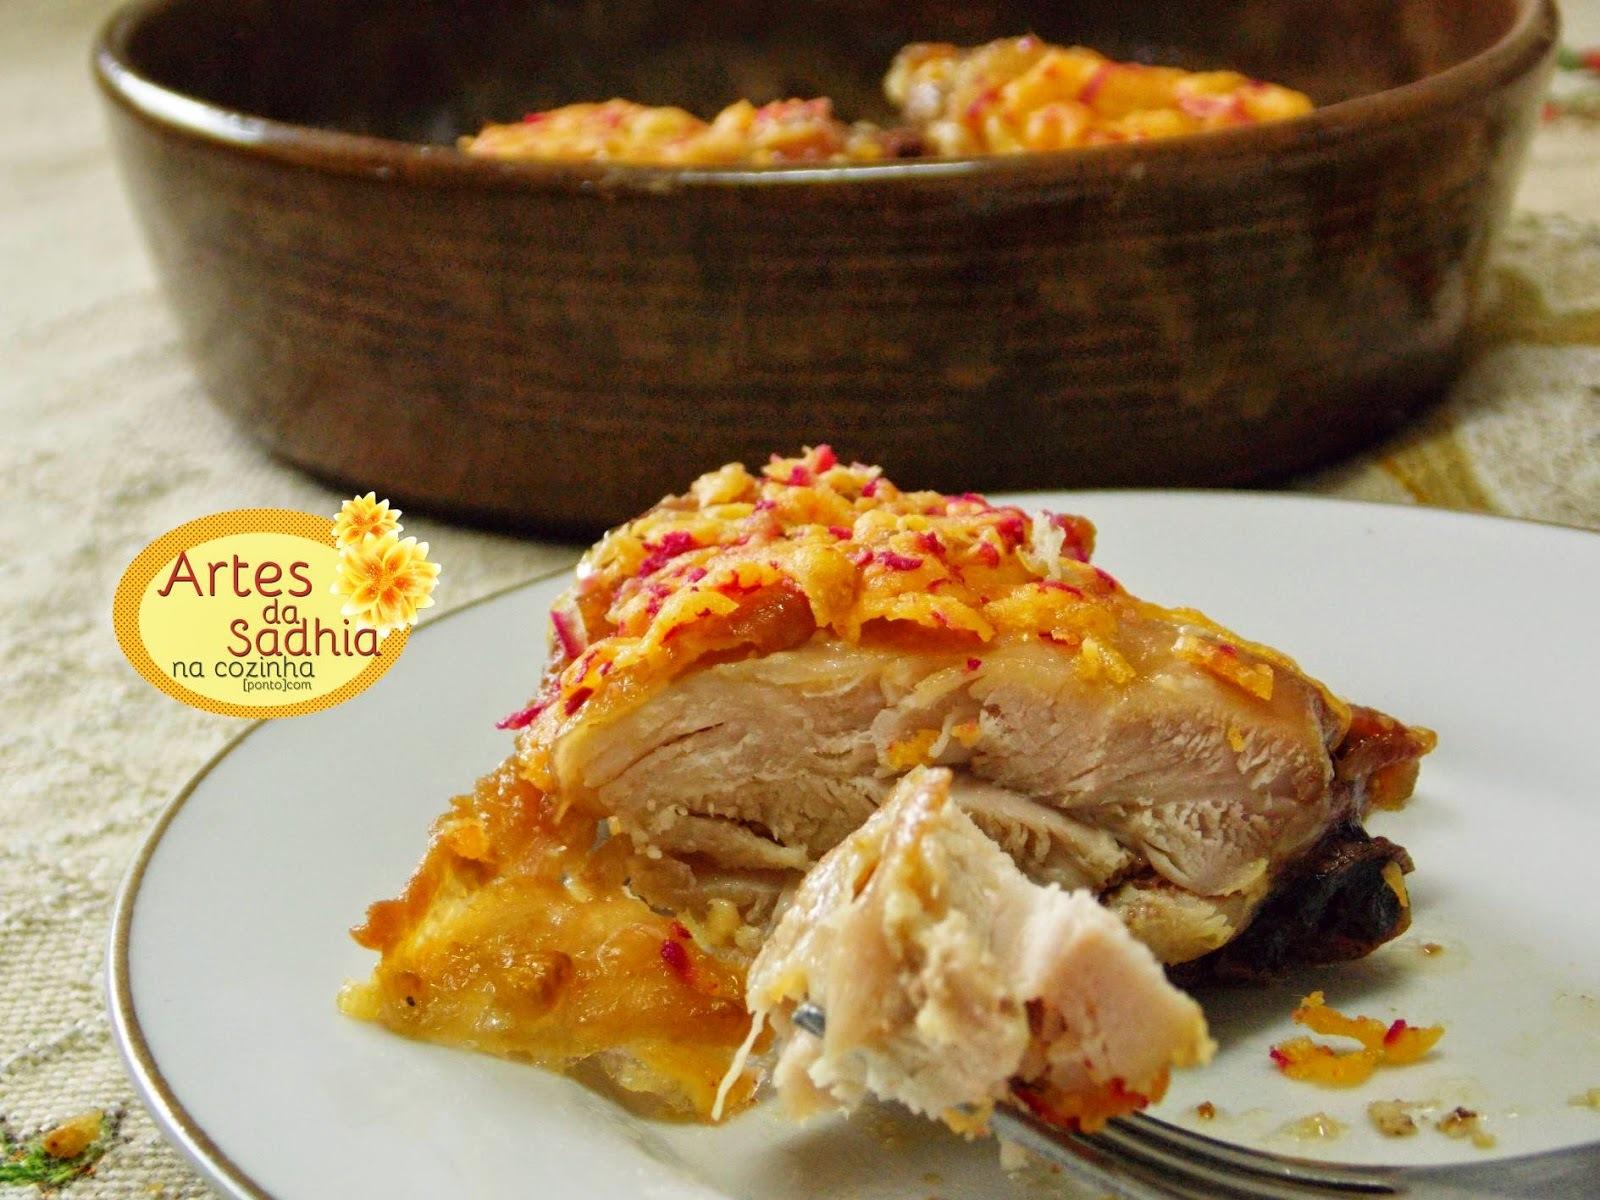 coxa e sobrecoxa de frango assado com queijo